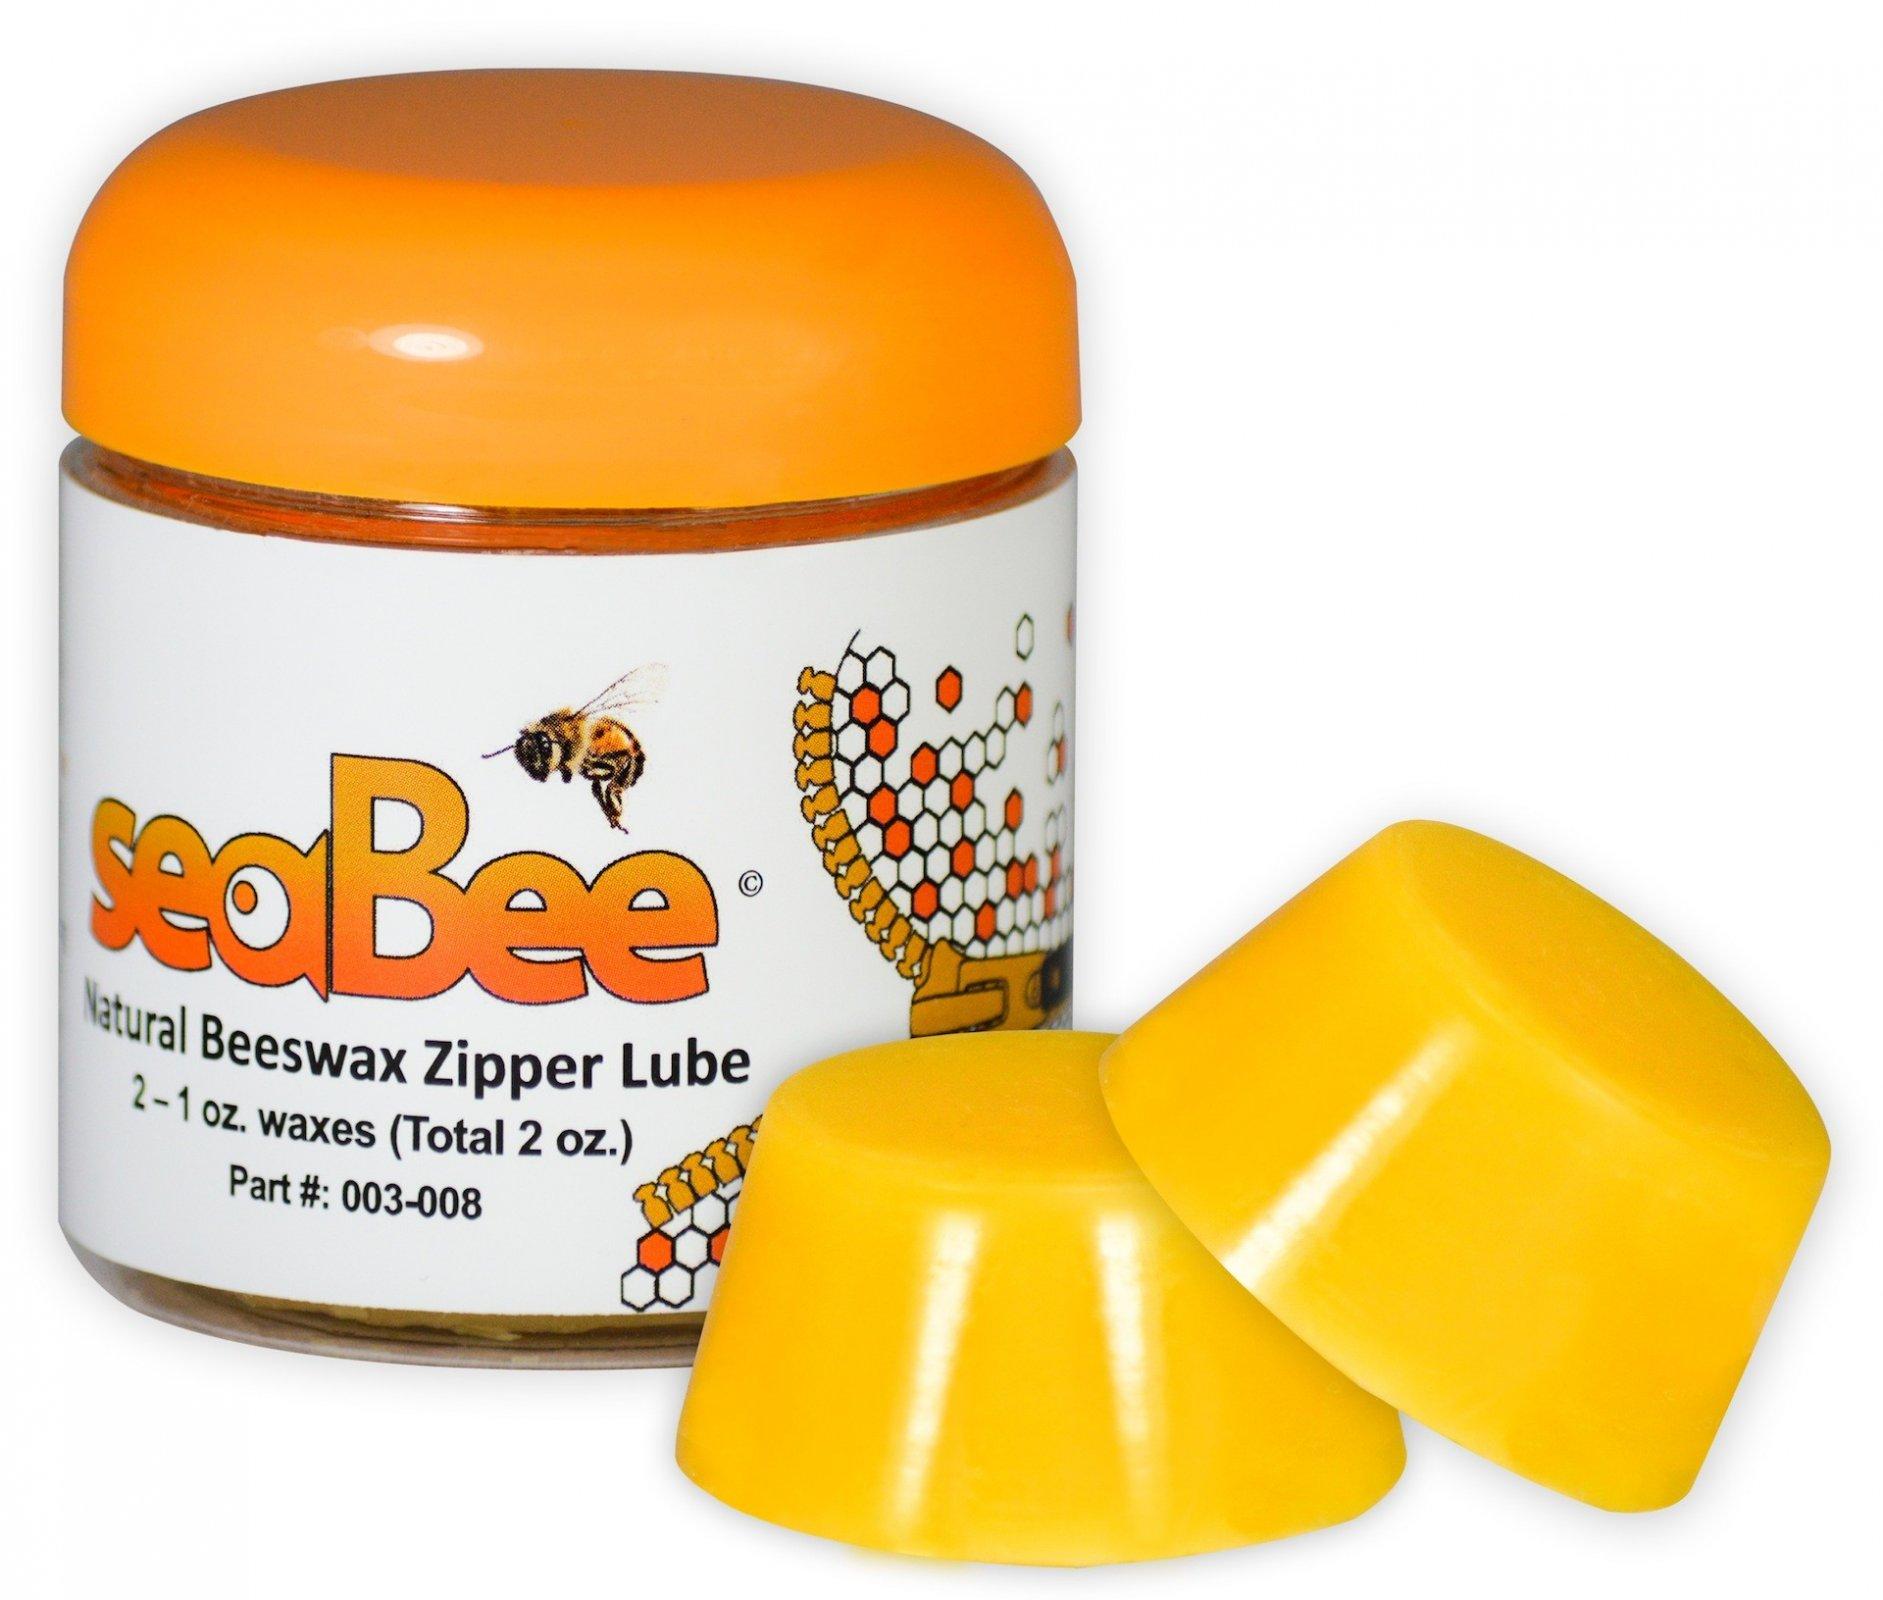 Beeswax Zipper Lube